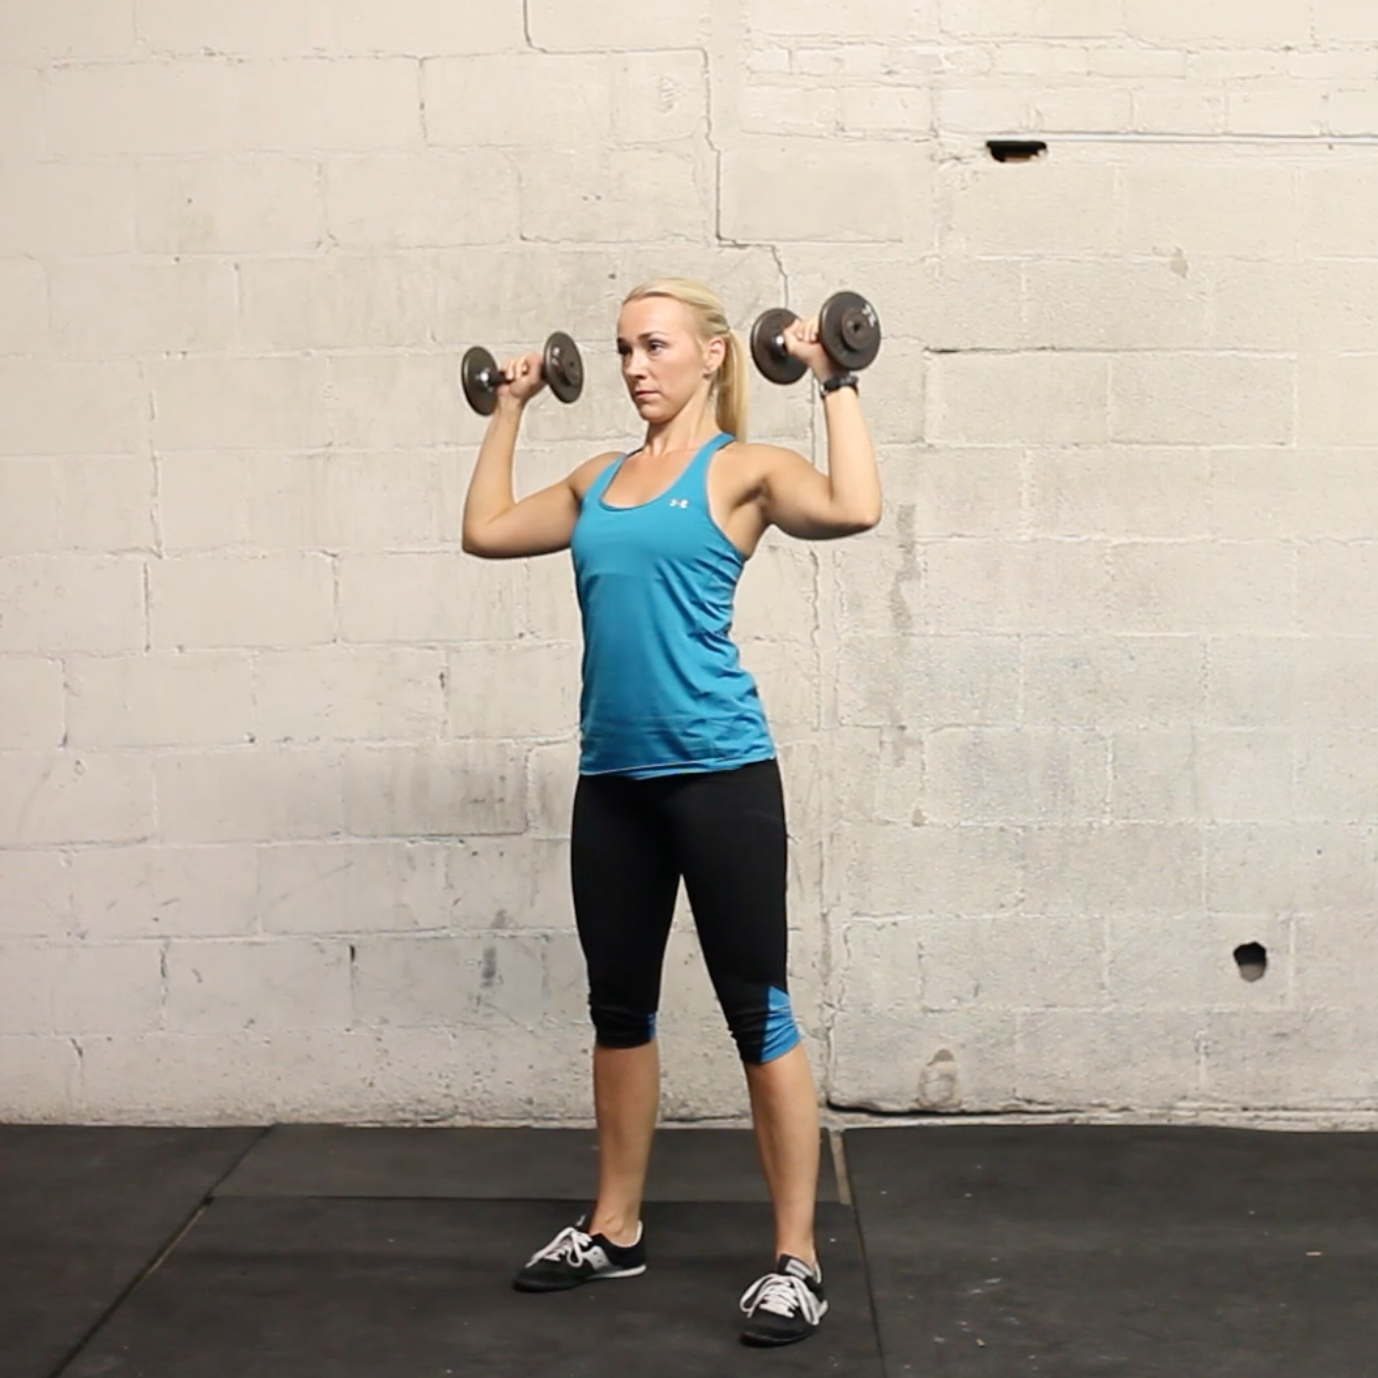 Warm up superset: overhead press + squat